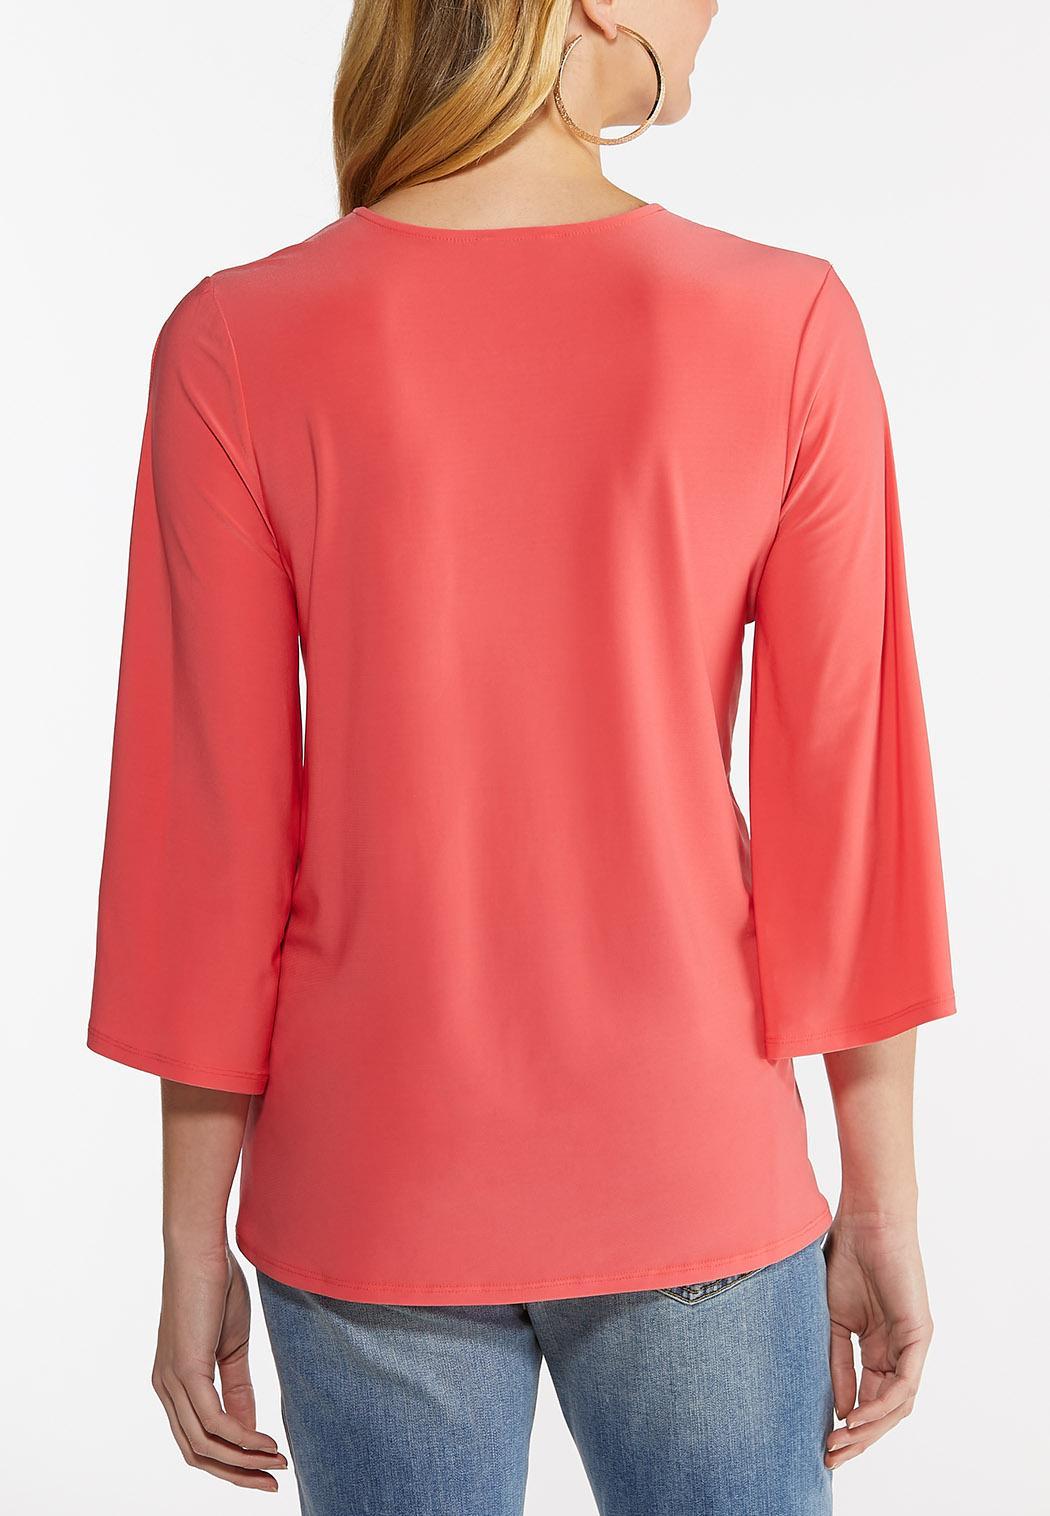 Embellished Coral Tunic (Item #44495979)